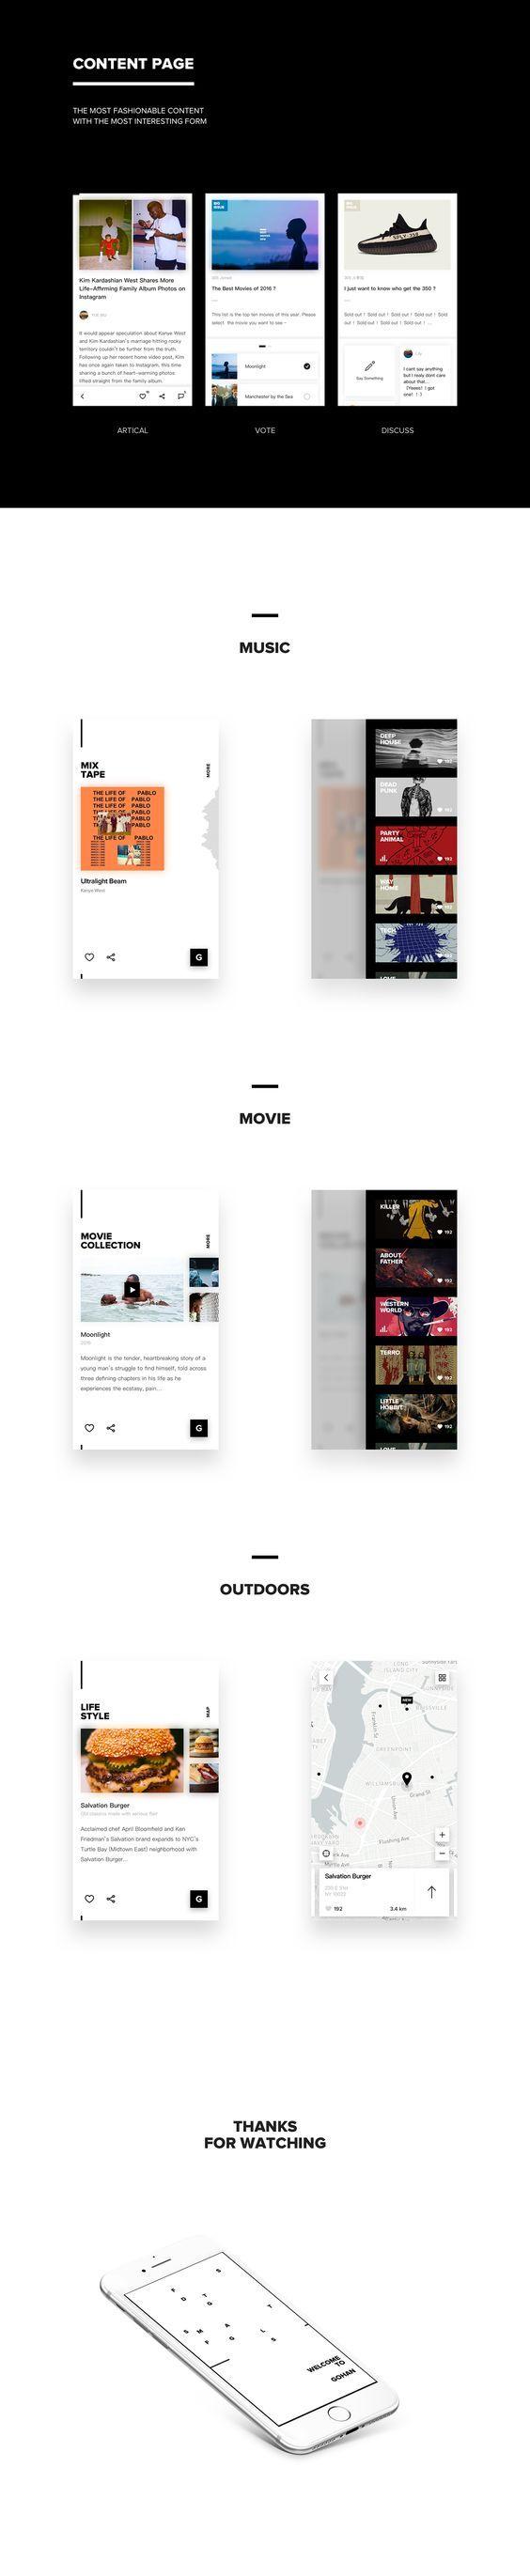 GOHAN - App Design on Behance